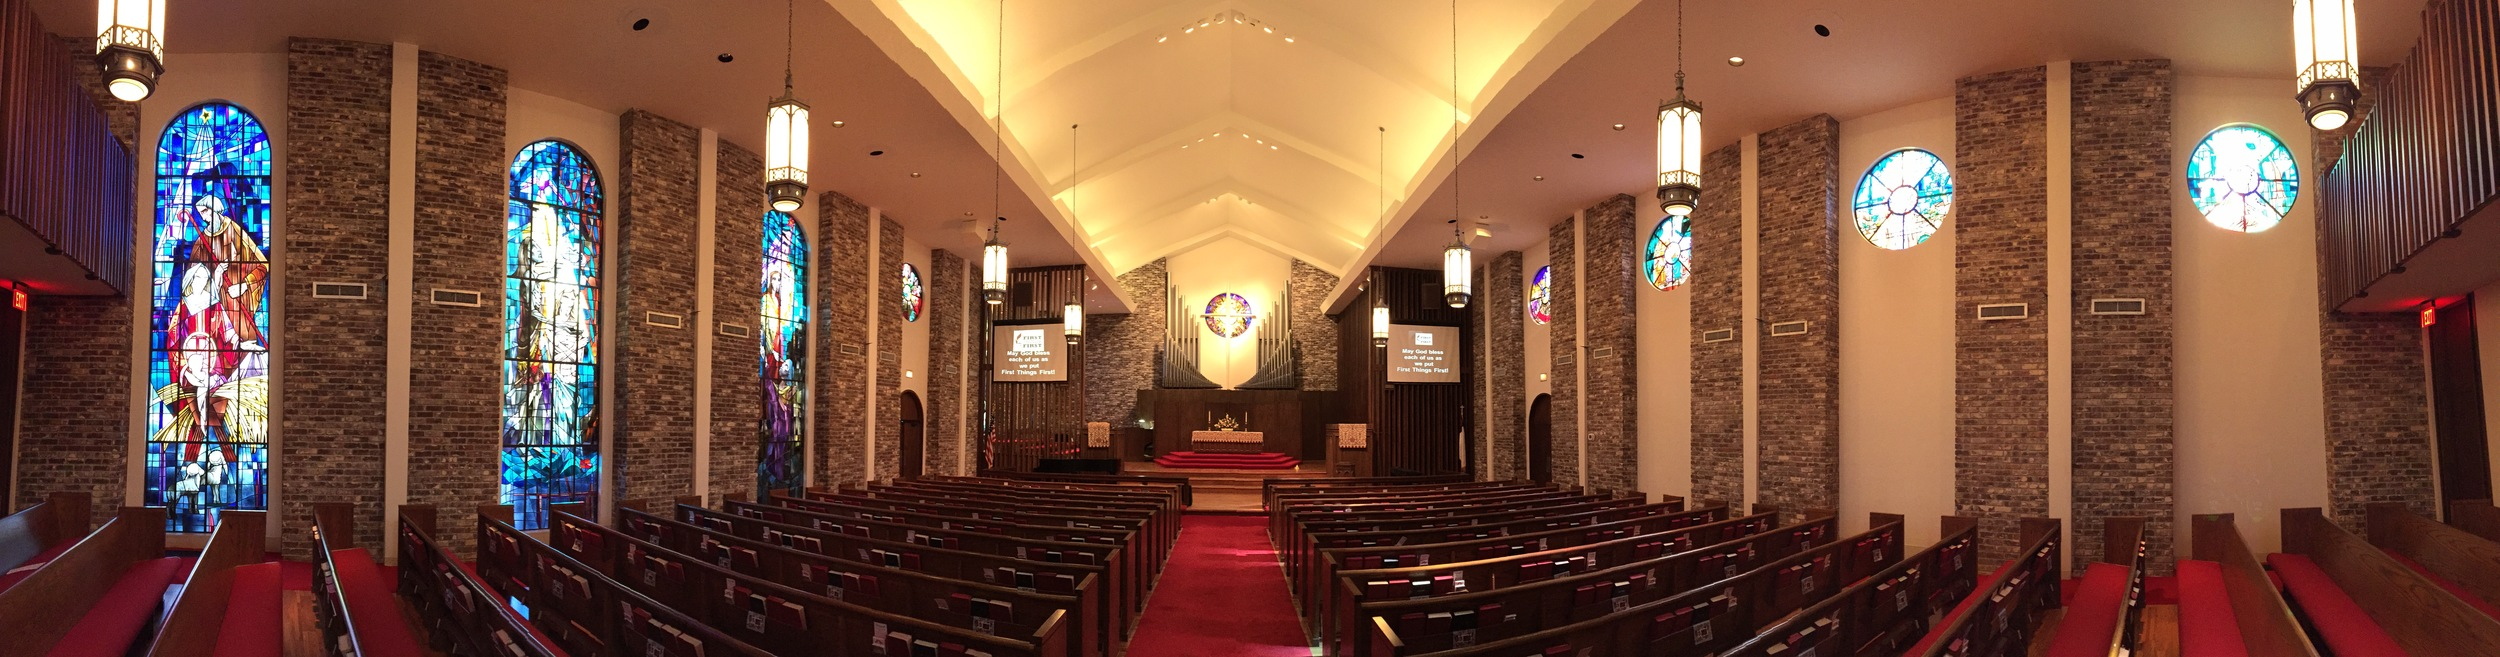 The Present Day Sanctuary